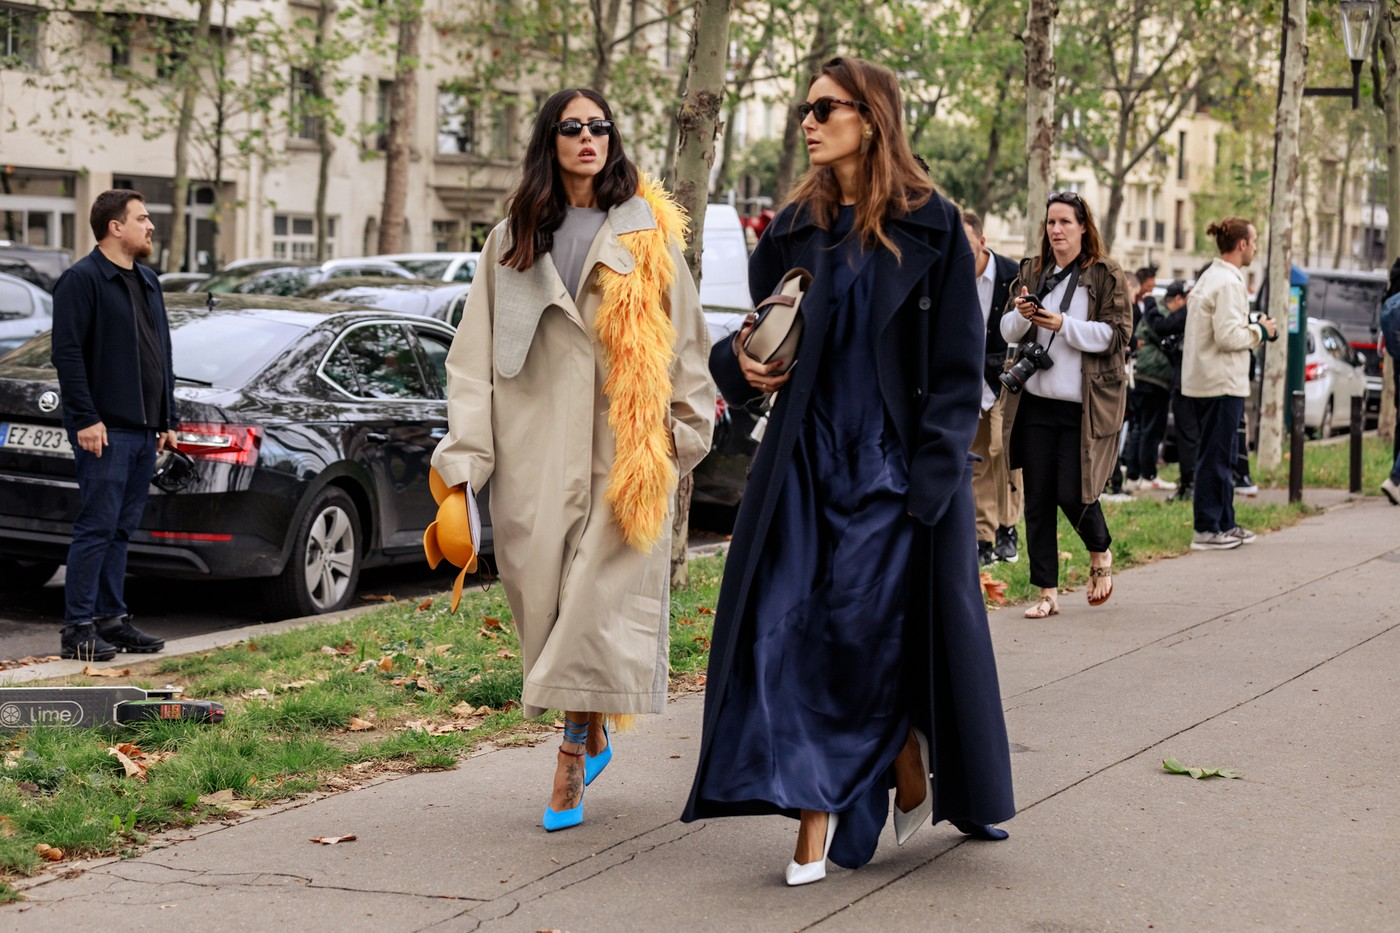 https___hypebeast.com_wp-content_blogs.dir_6_files_2019_09_paris-fashion-week-street-style-looks-ss20-6072